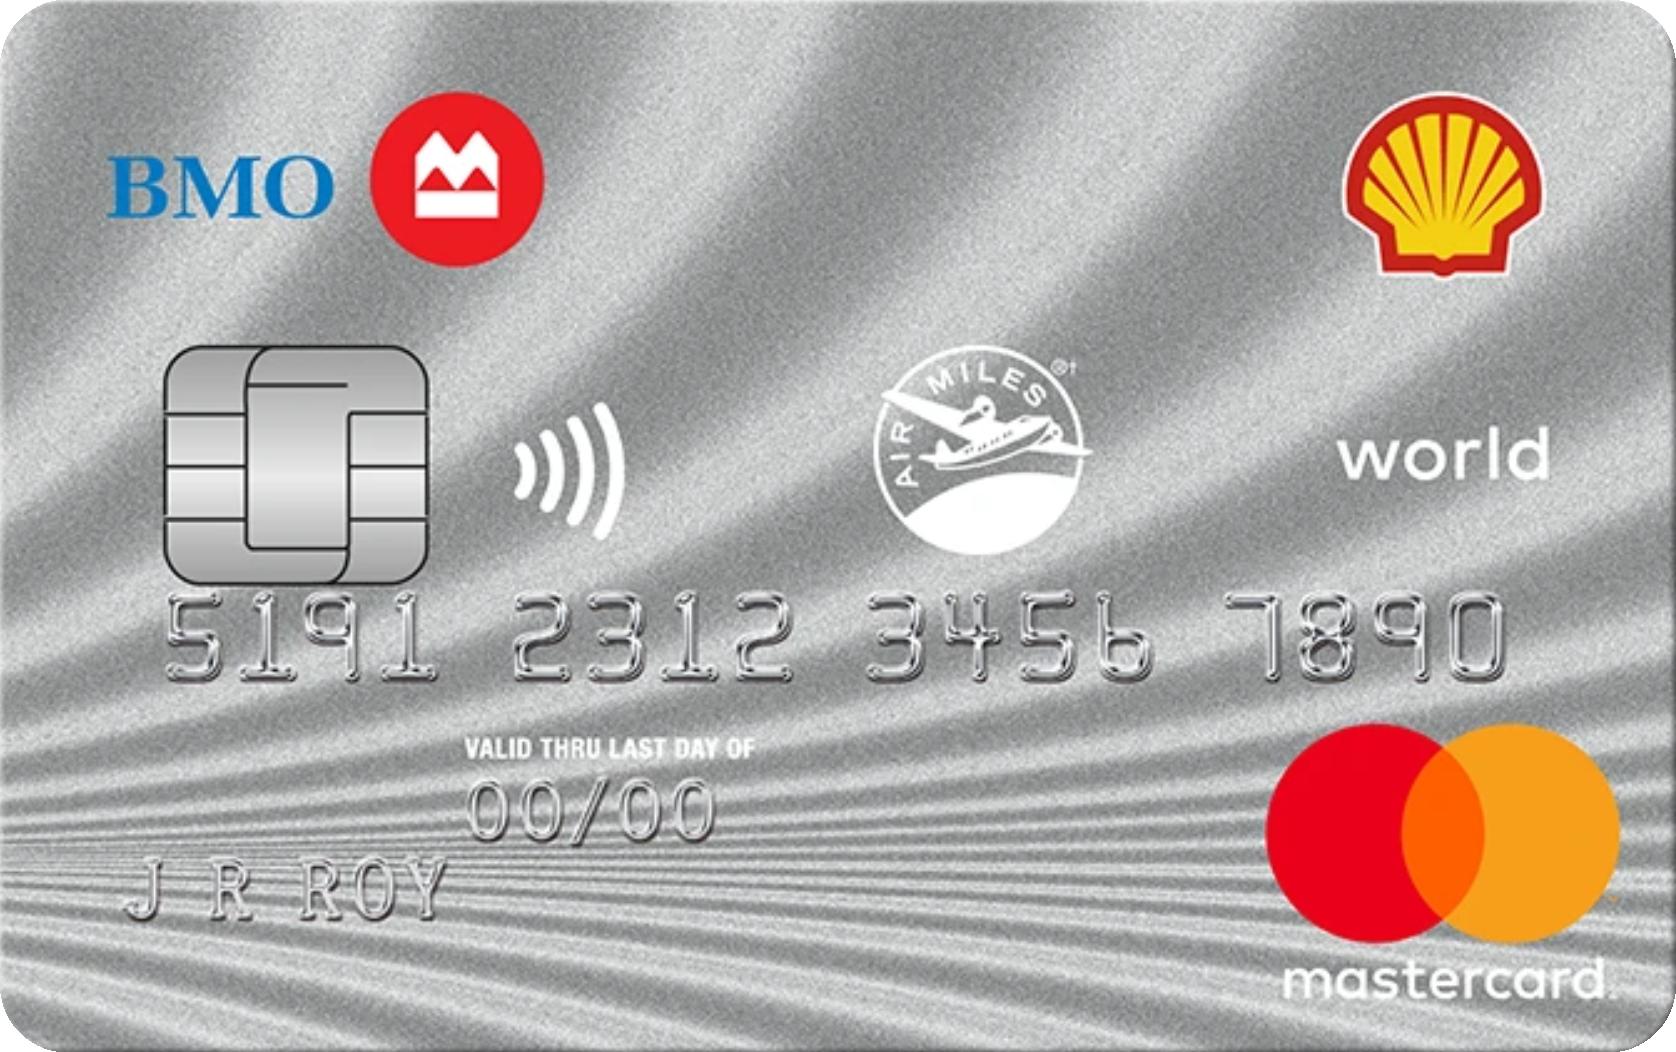 Shell AIR MILES® World MasterCard® from BMO logo